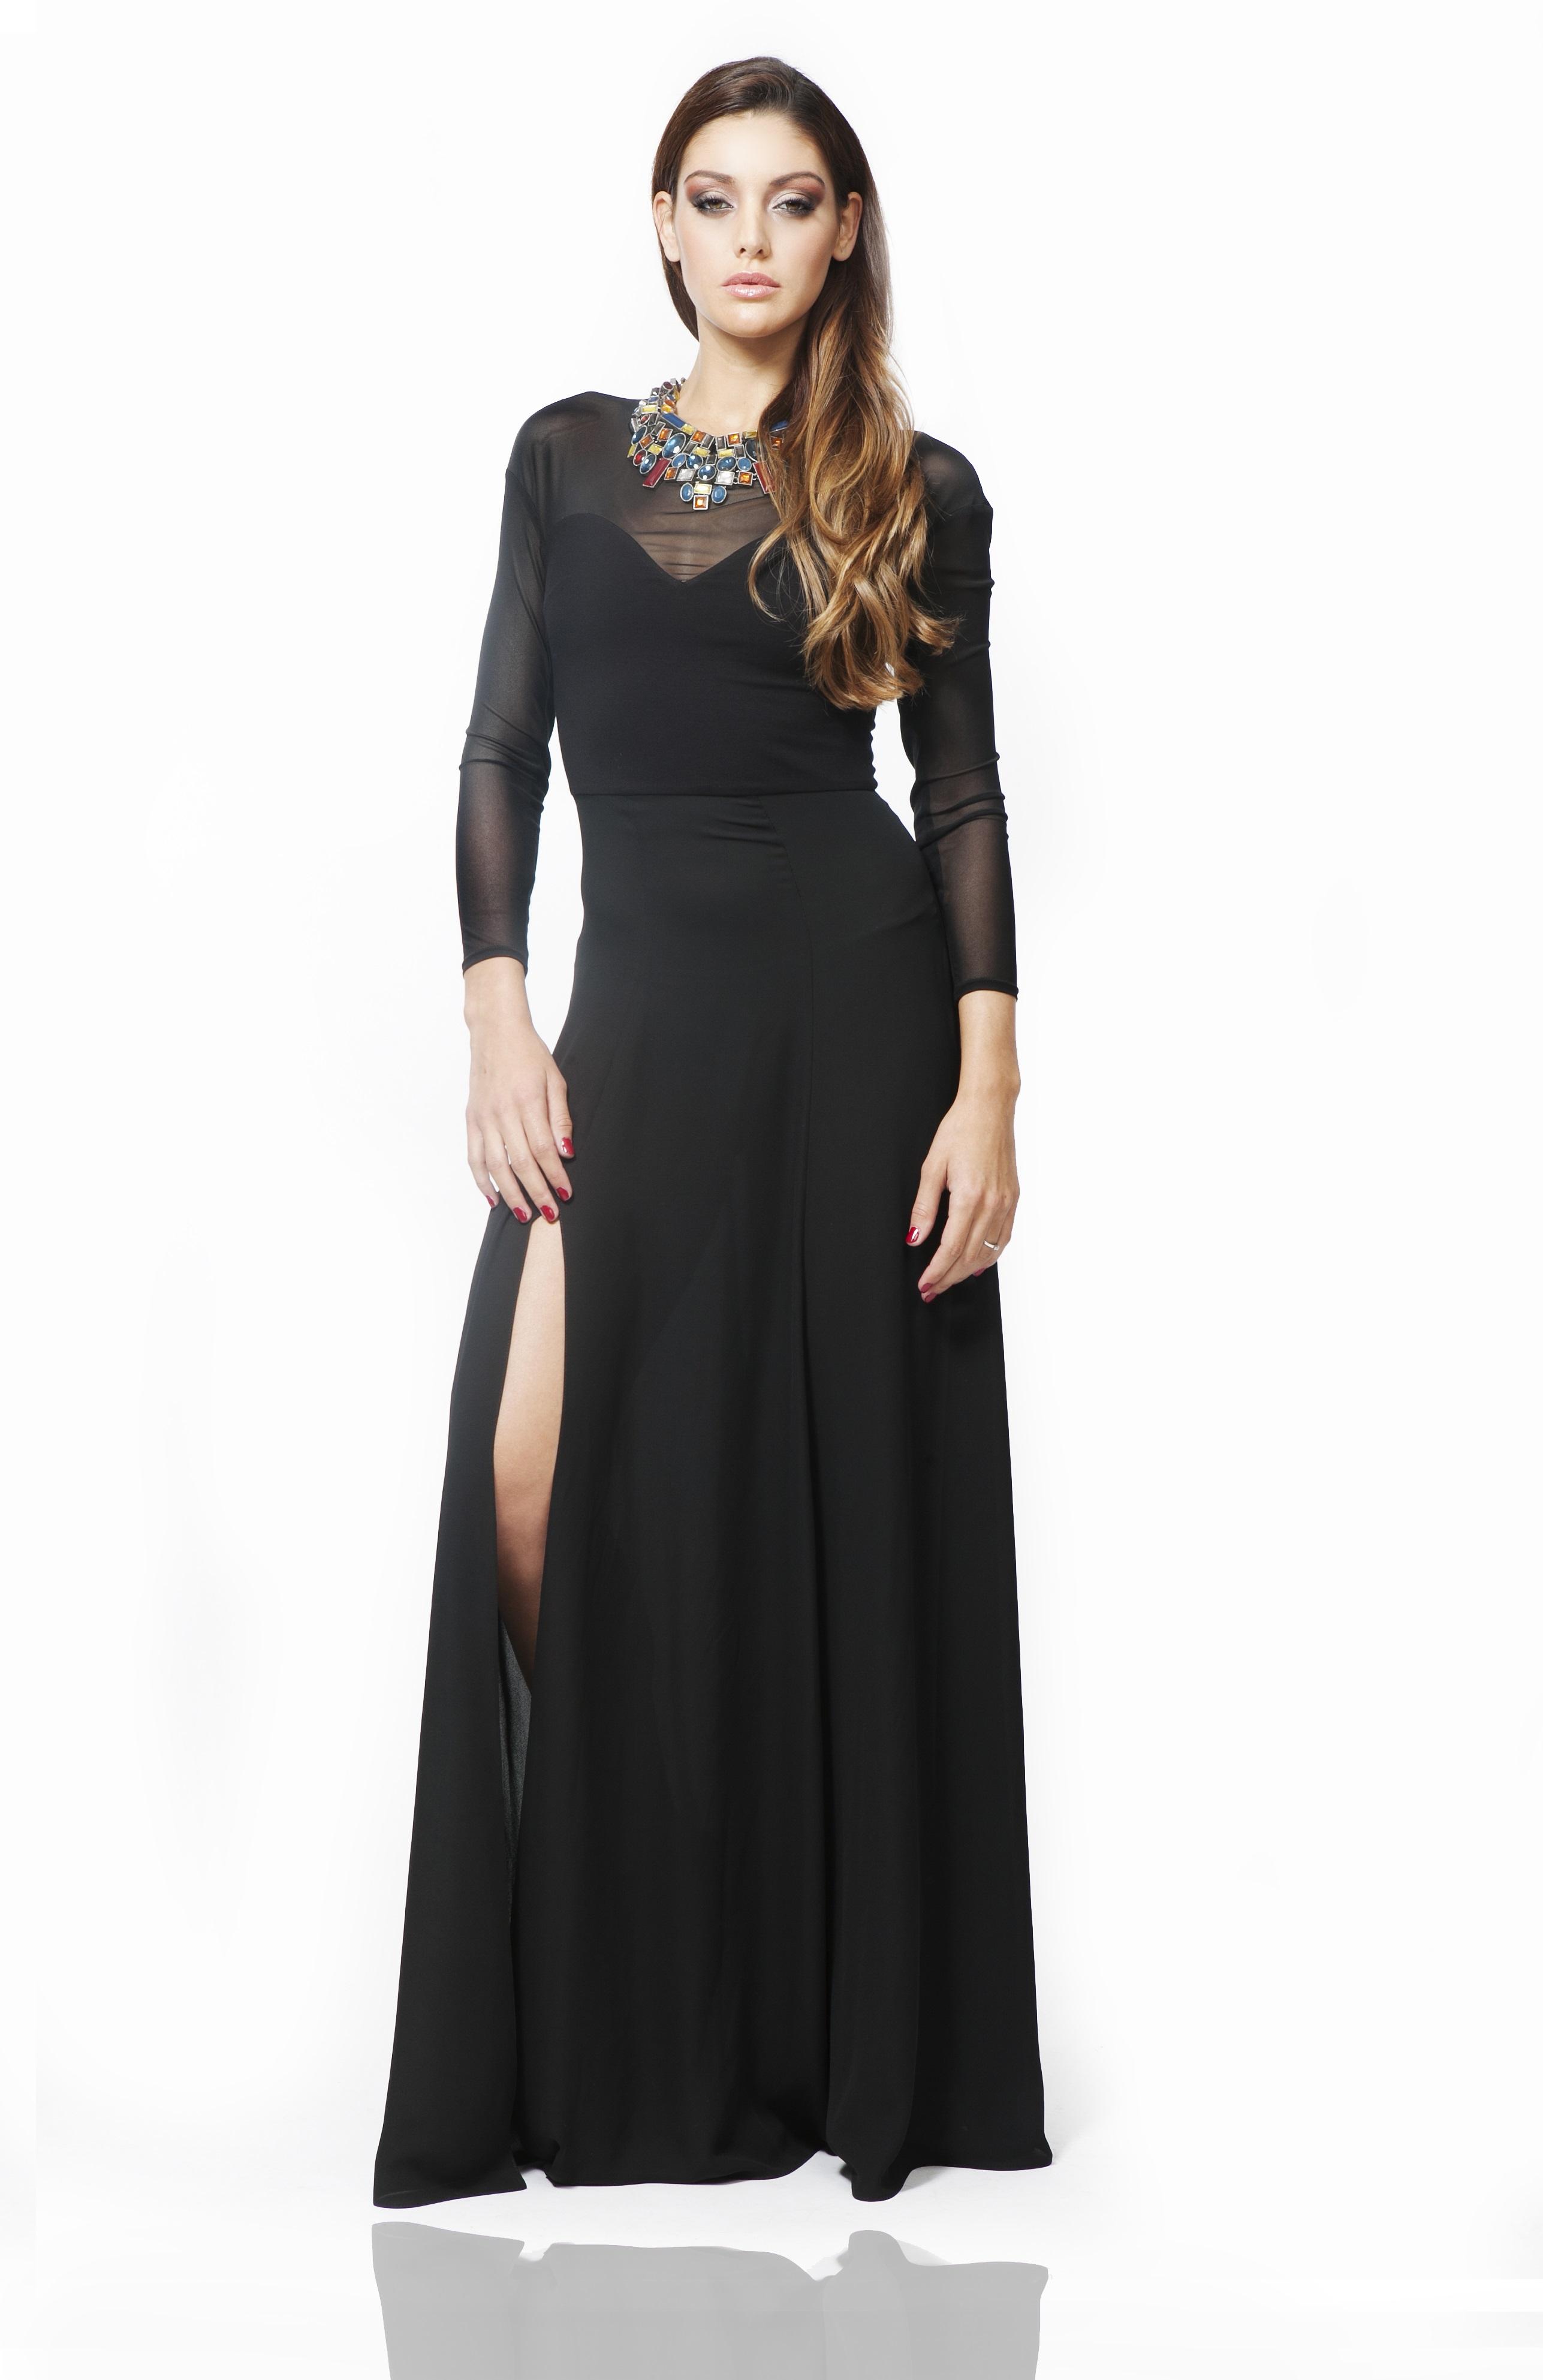 AMNESIA Elegáns fekete ruha - Amnesia webáruház dccb5e0048